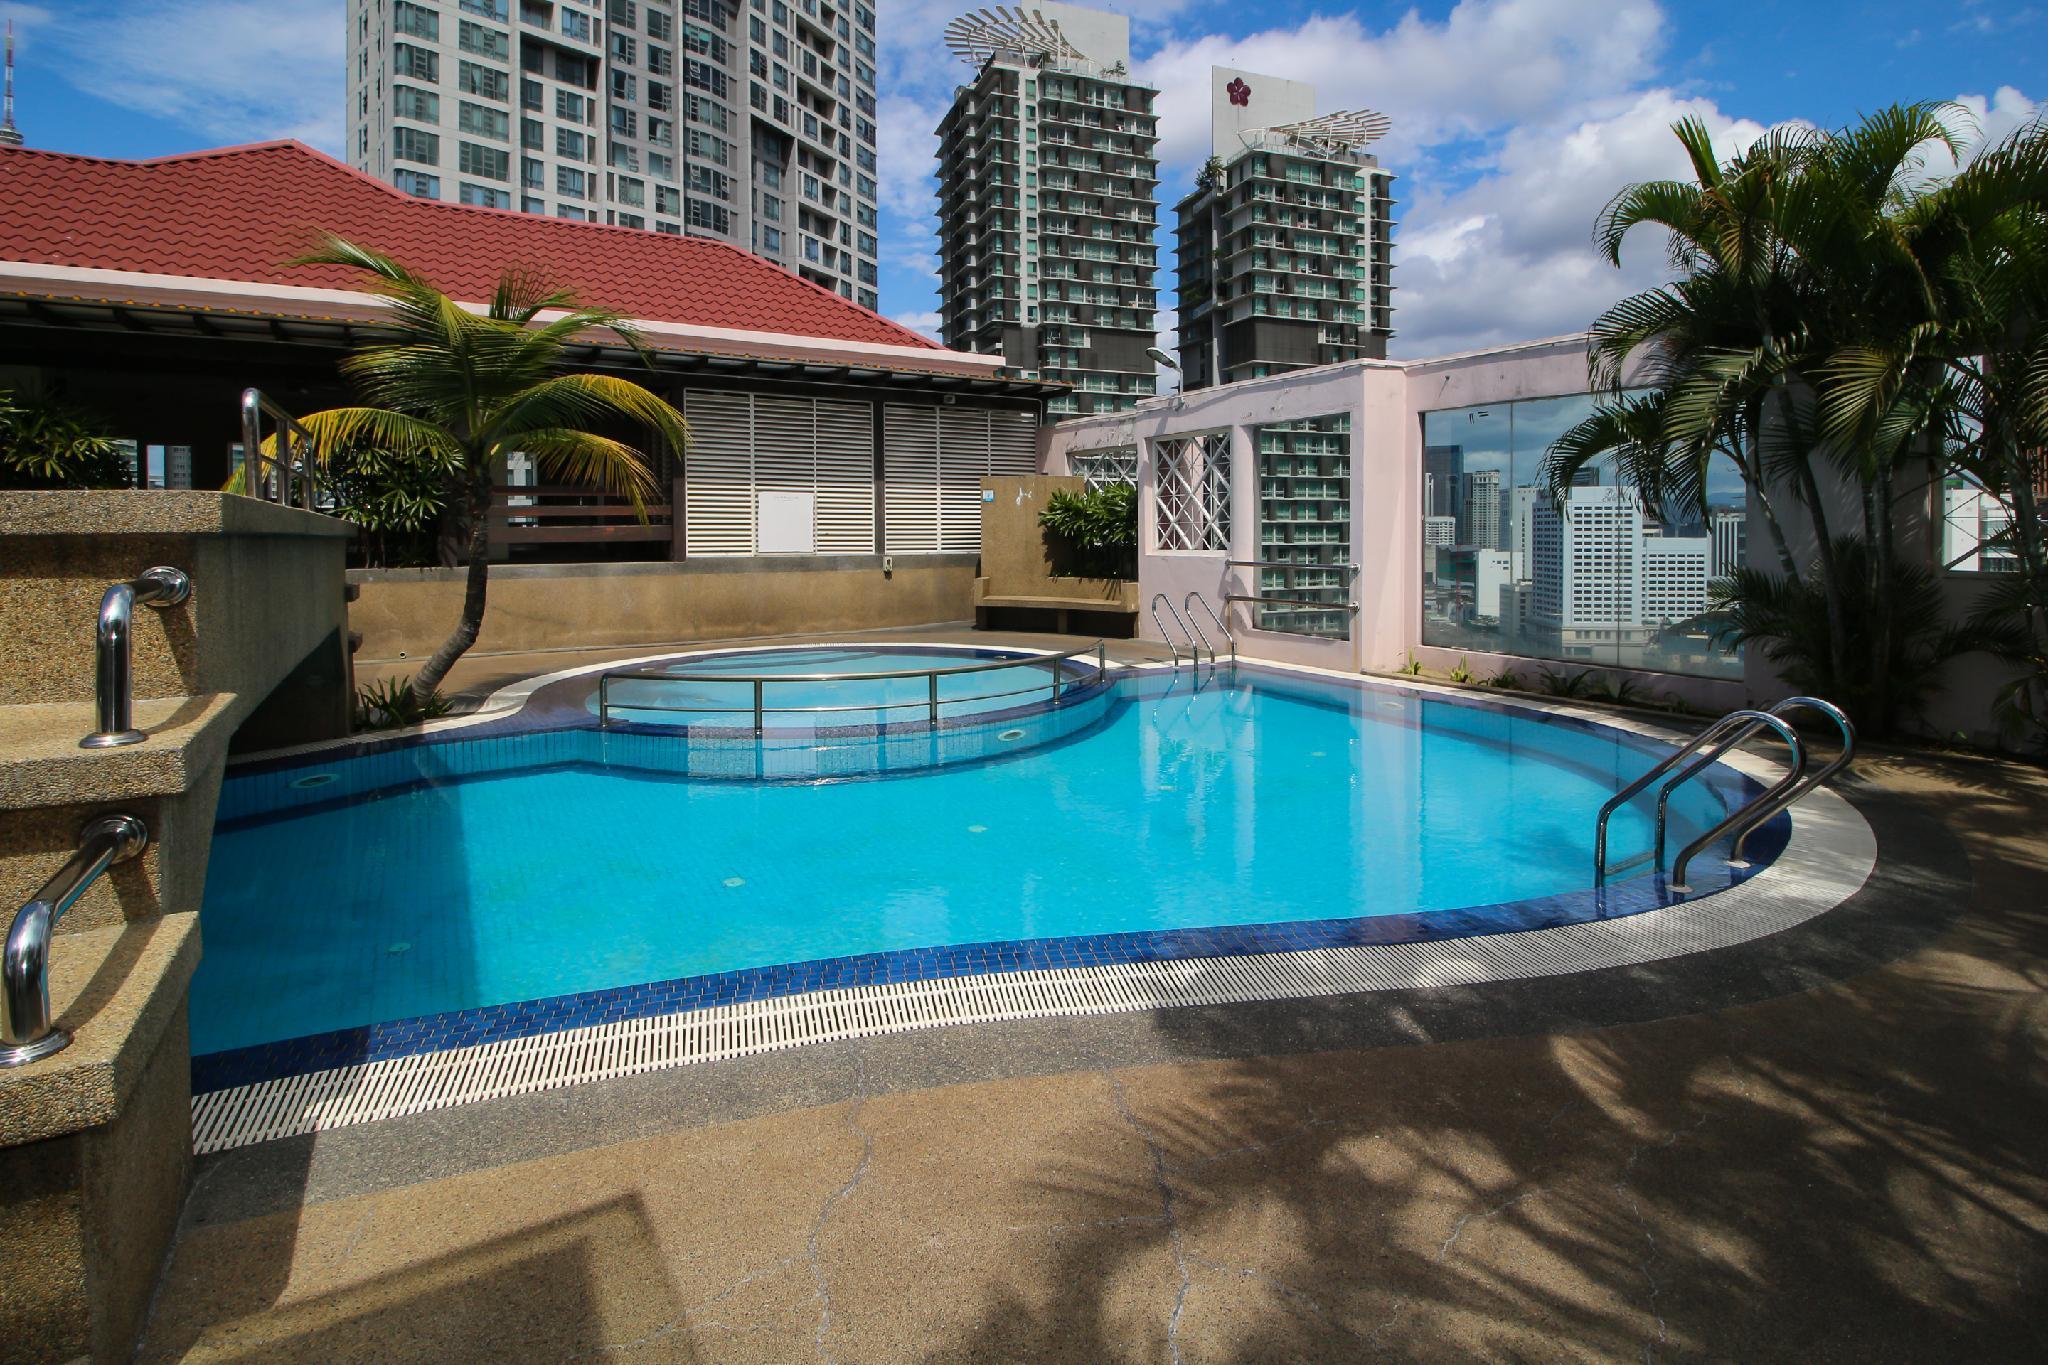 OYO Home 643 Luxury 1BR Casa Mutiara